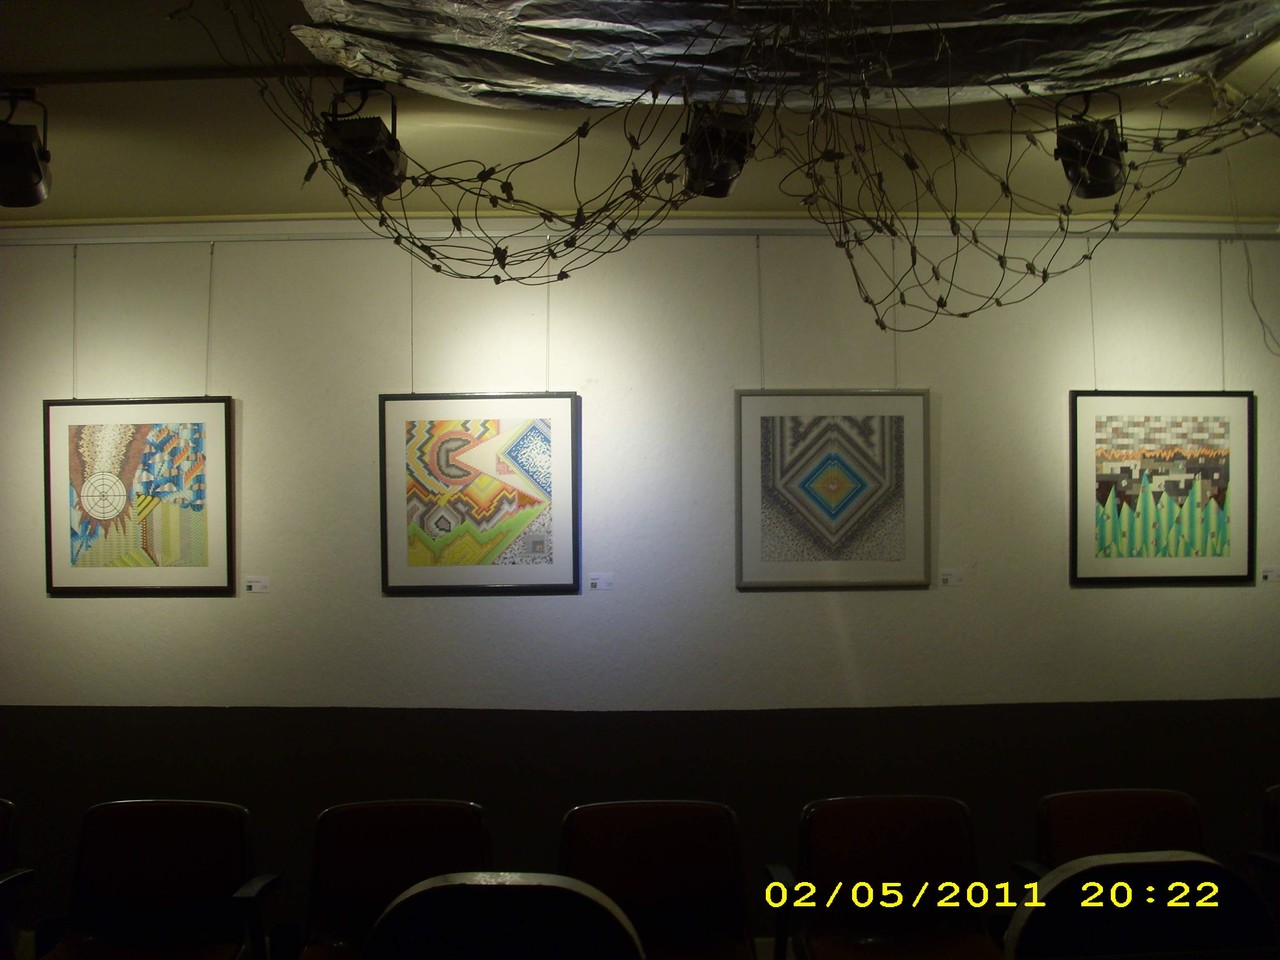 Dieter ZawoDniak - jazz ART galerie 02.05.2011